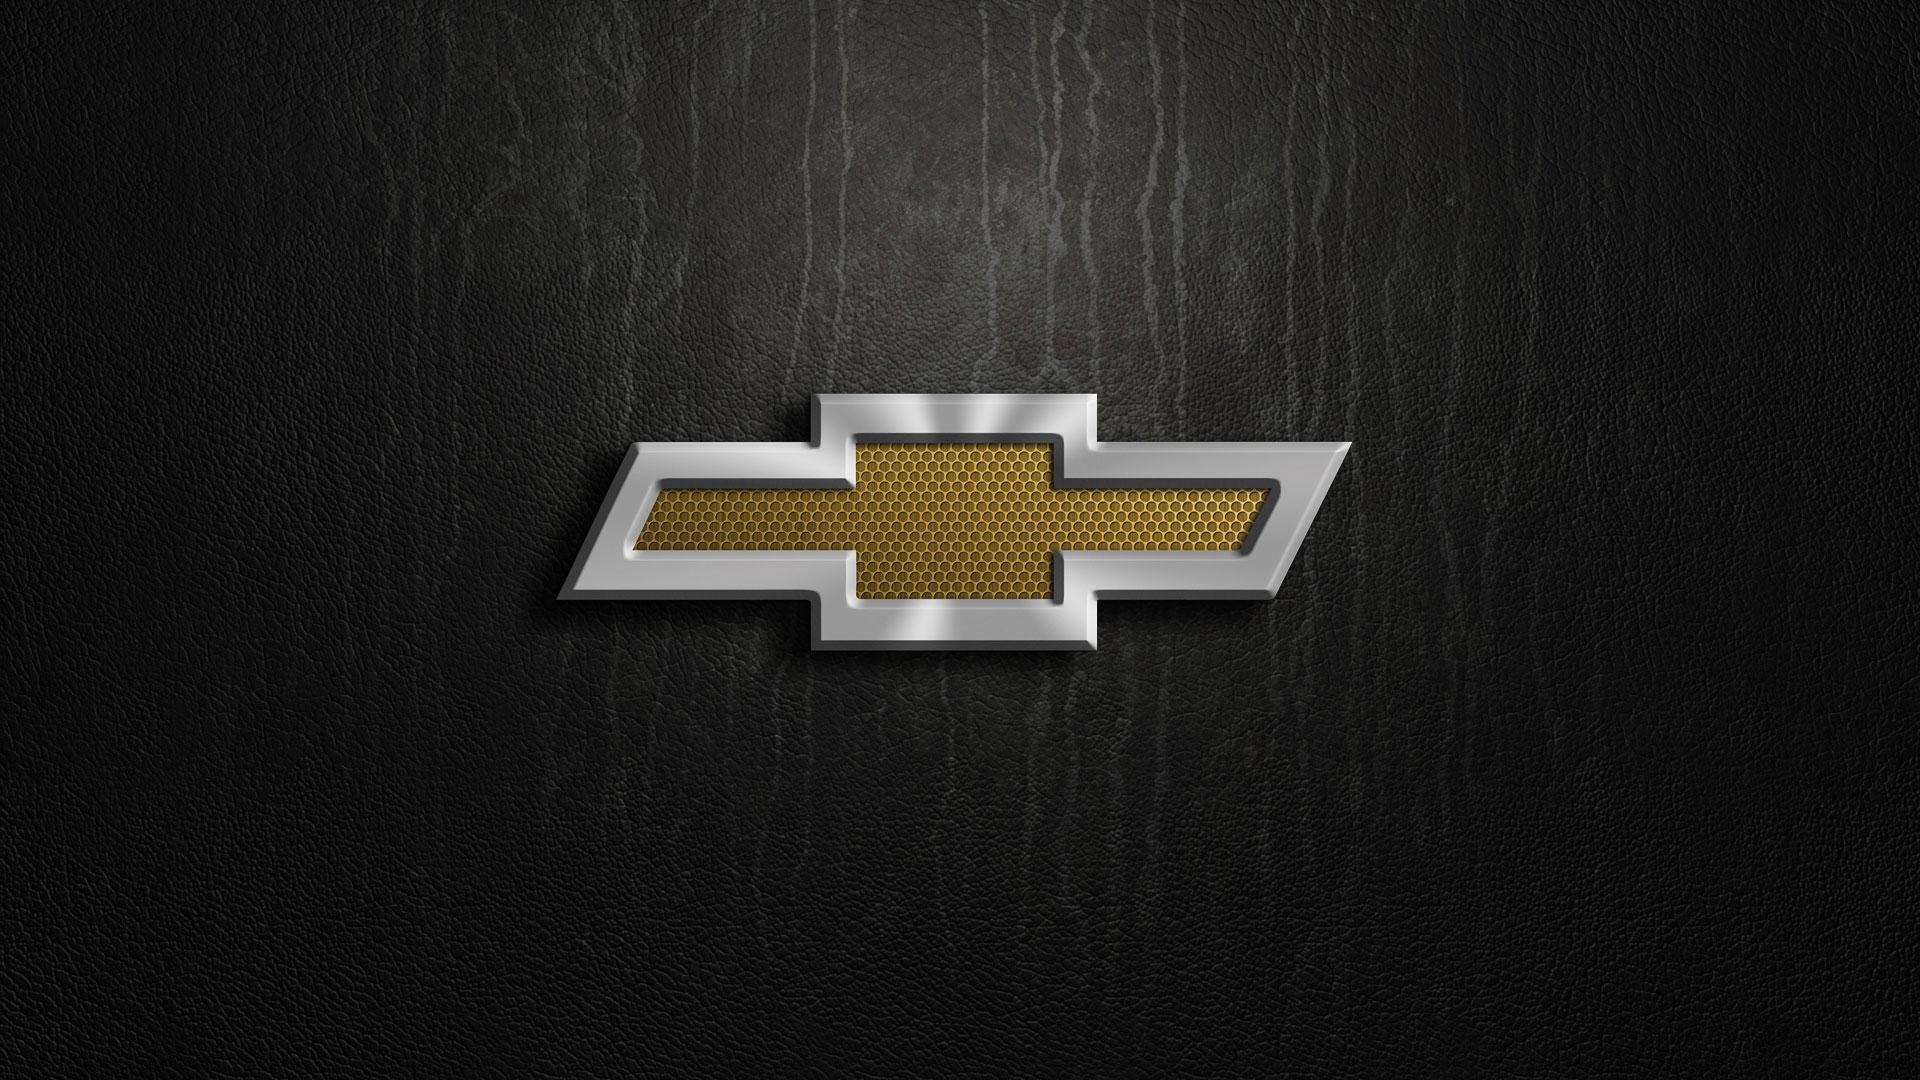 Chevy Wallpaper - QyGjxZ